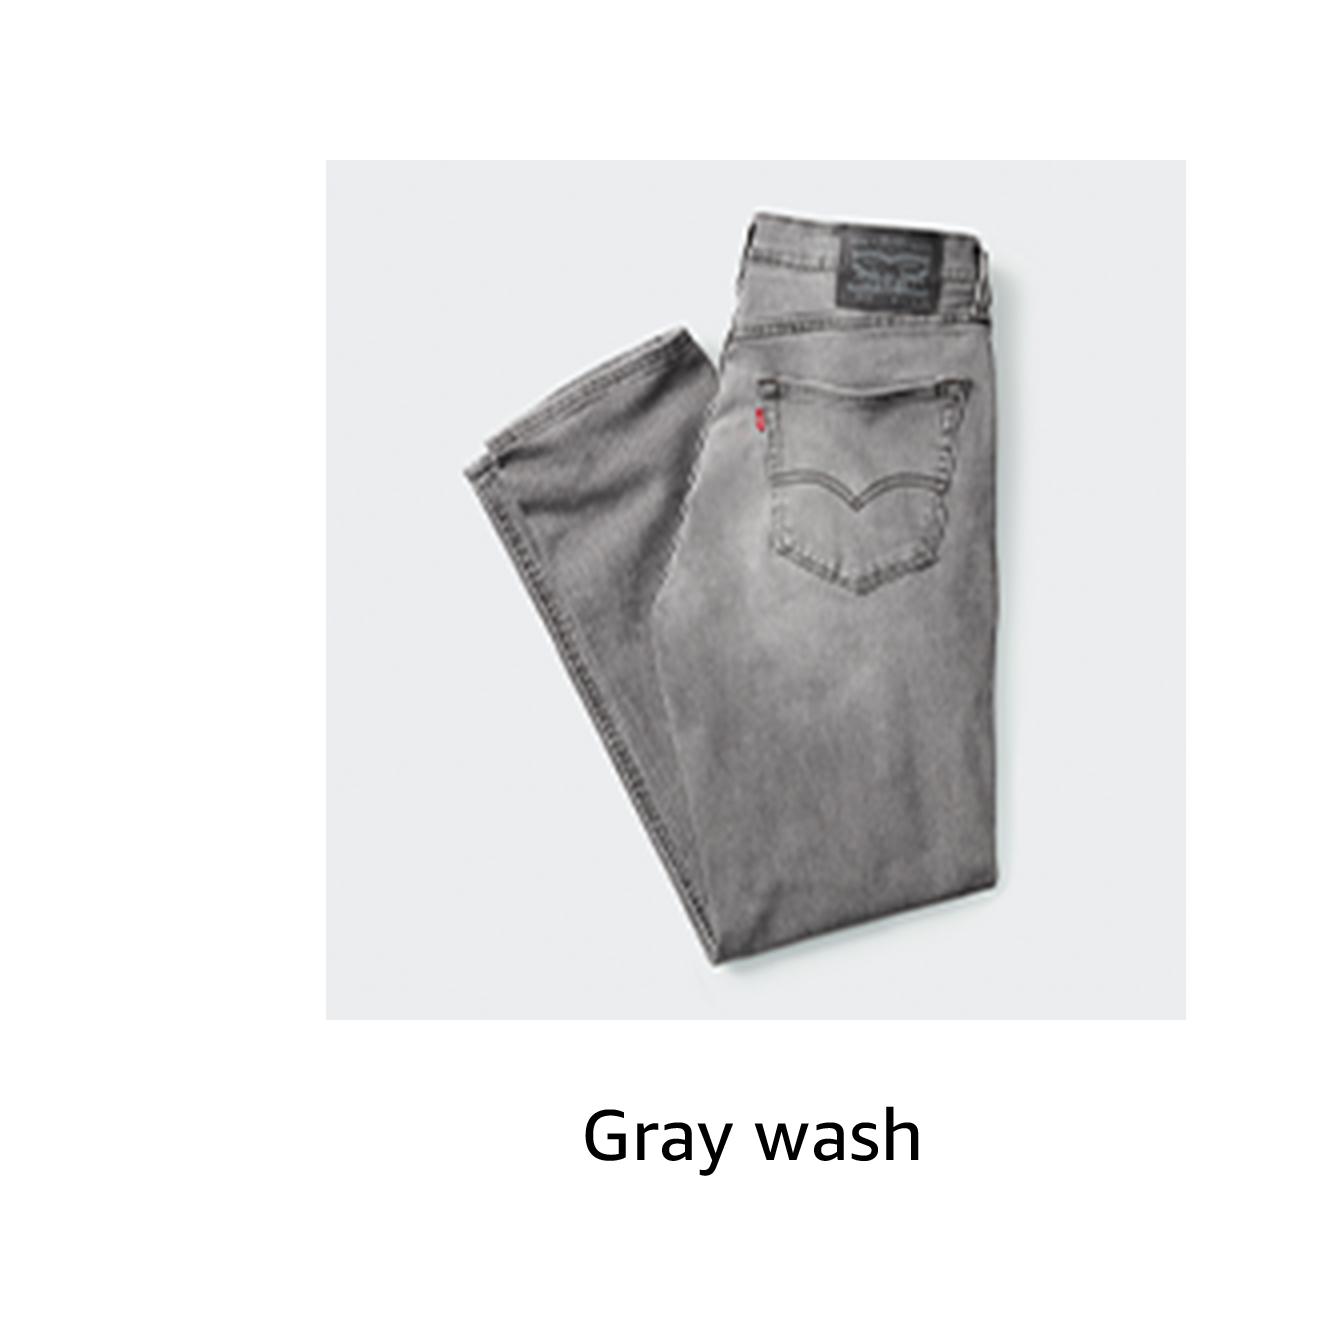 Gray wash